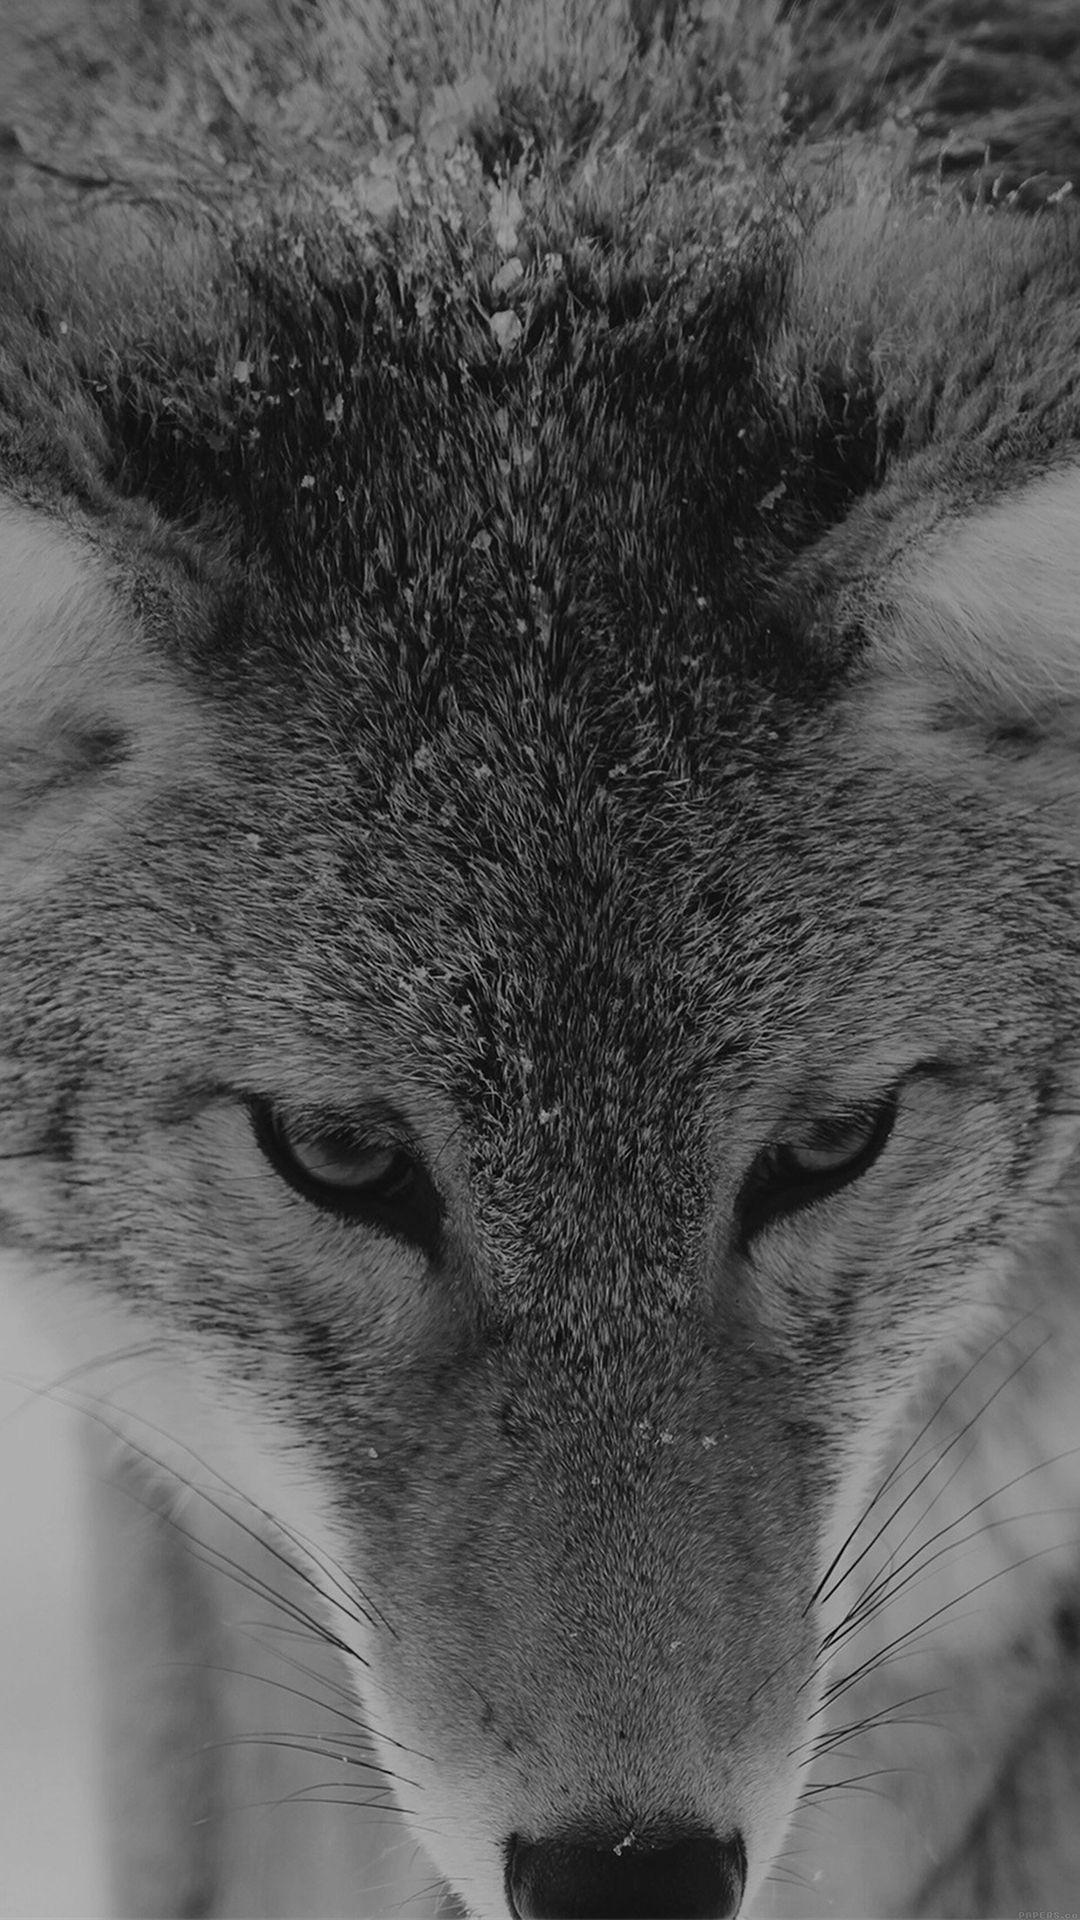 Wolf Wallpaper Iphone 6s Plus Kadada Org